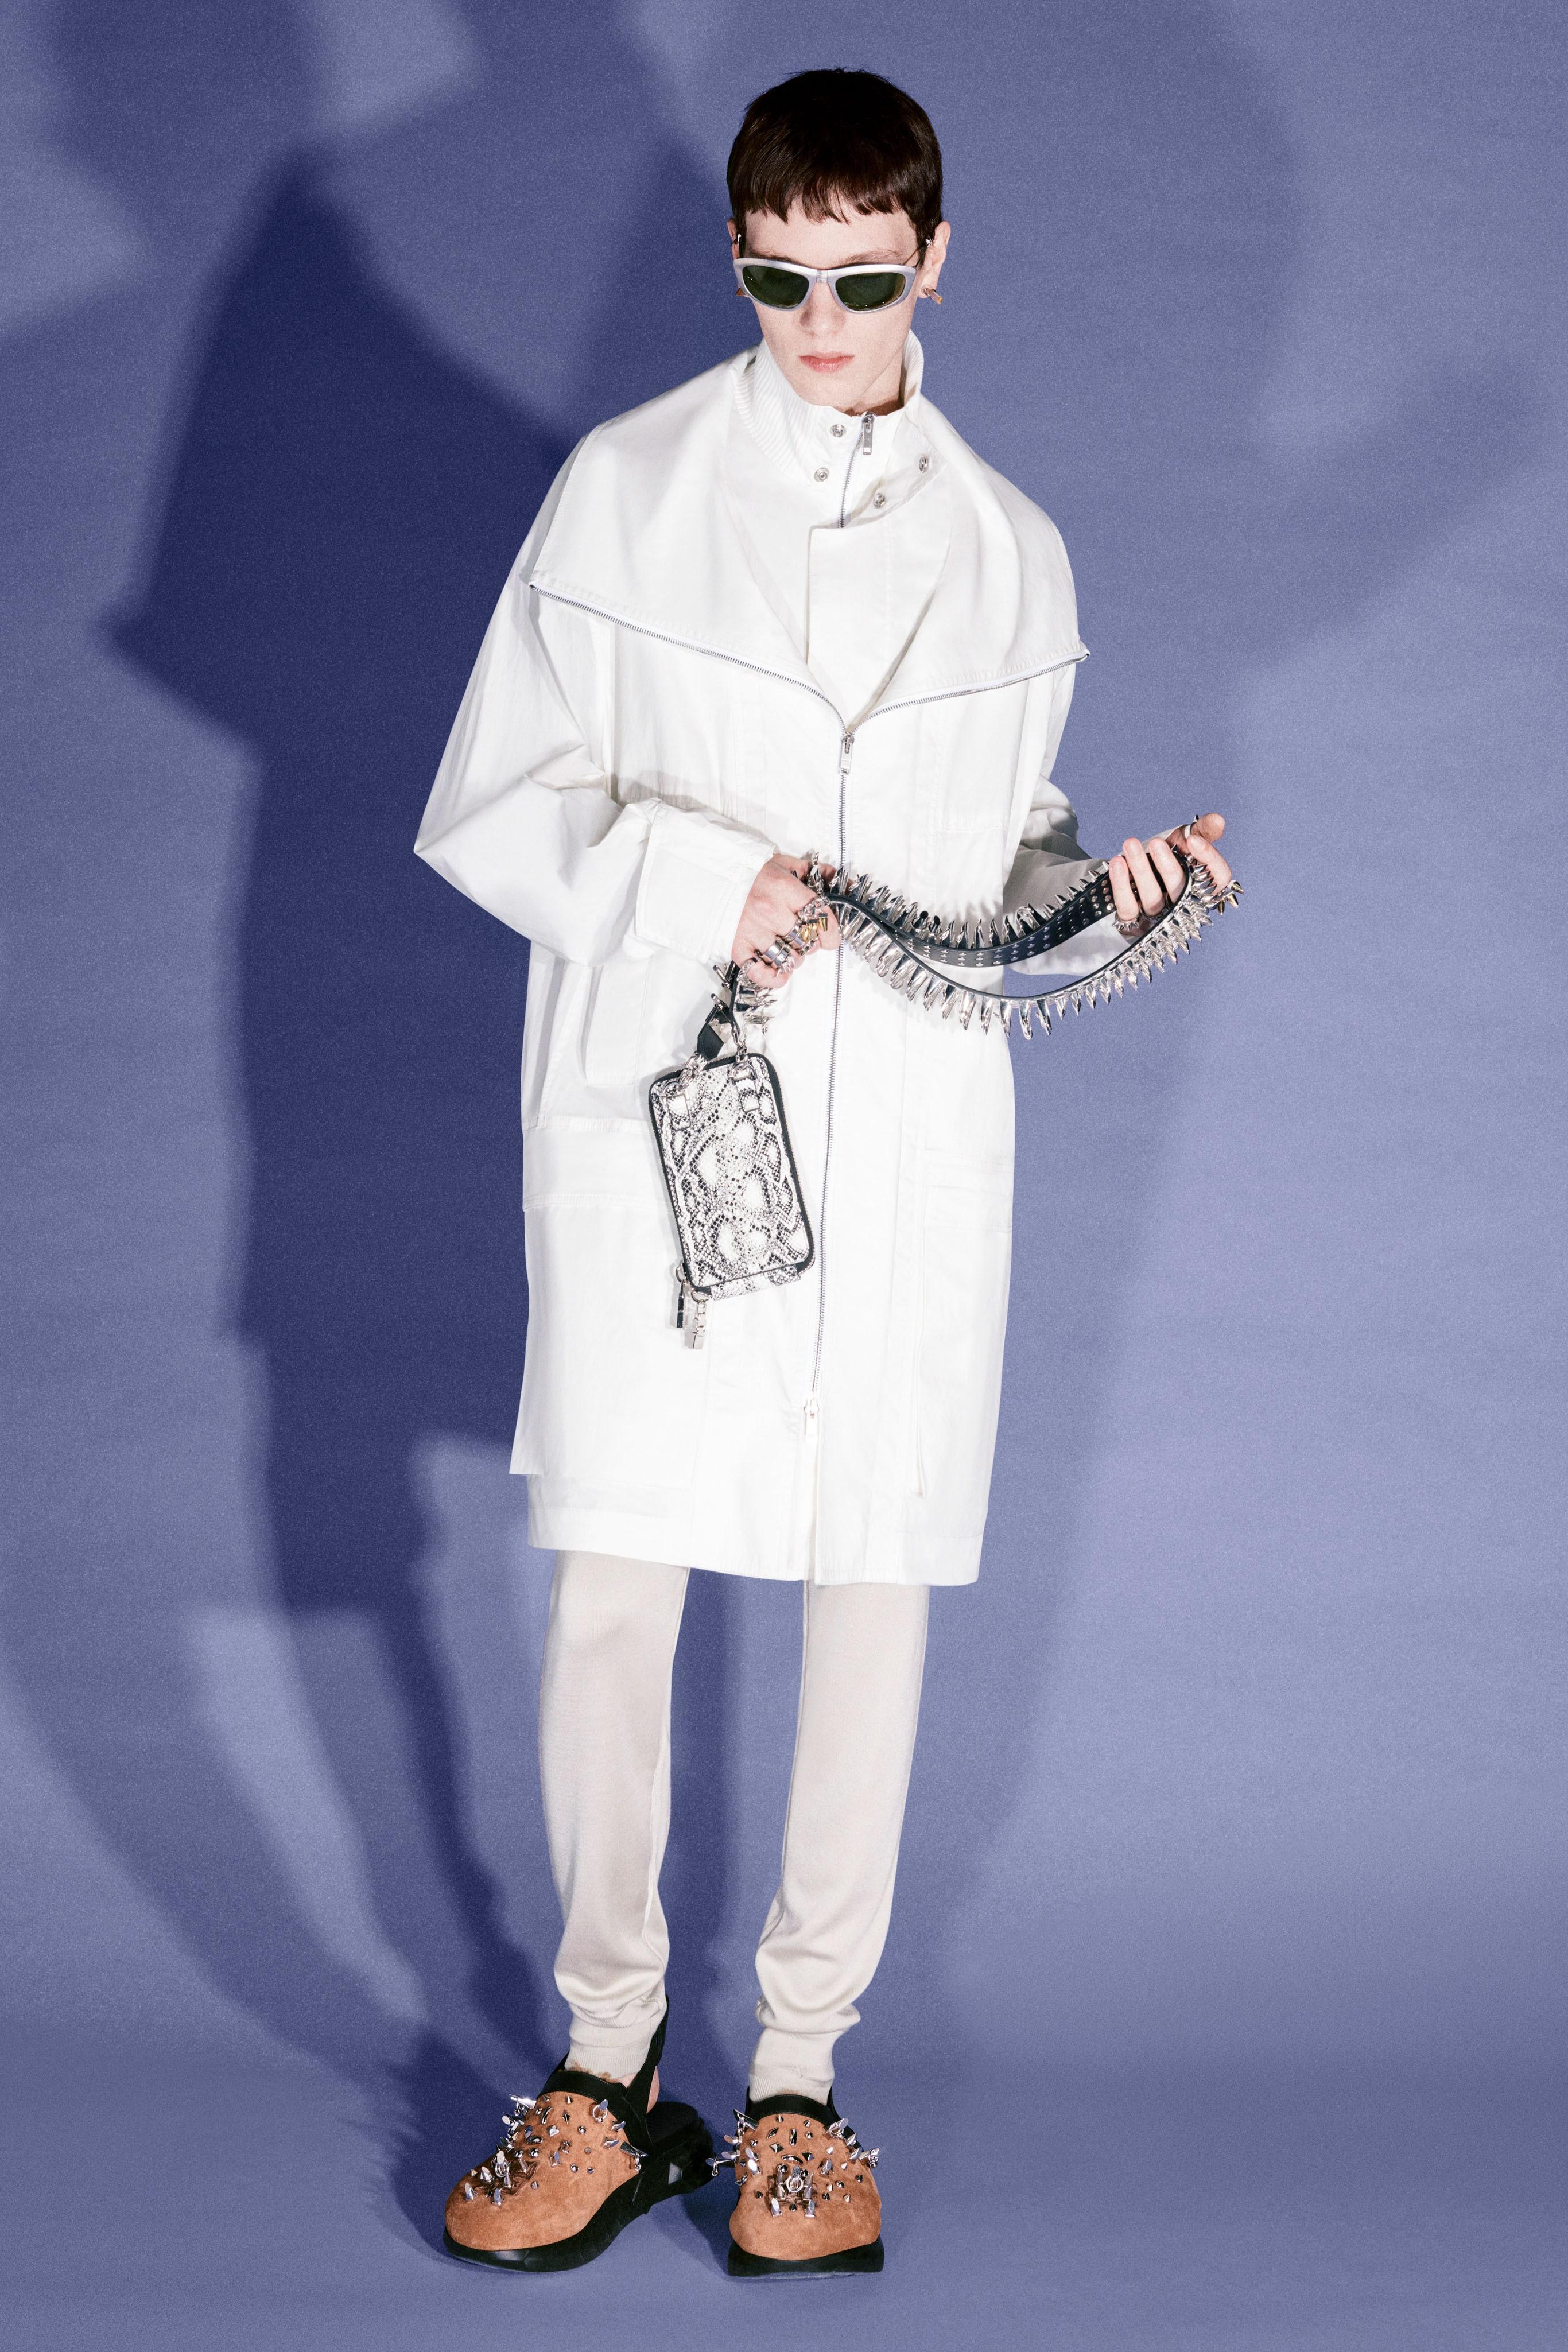 00027-Givenchy-Pre-Fall-21